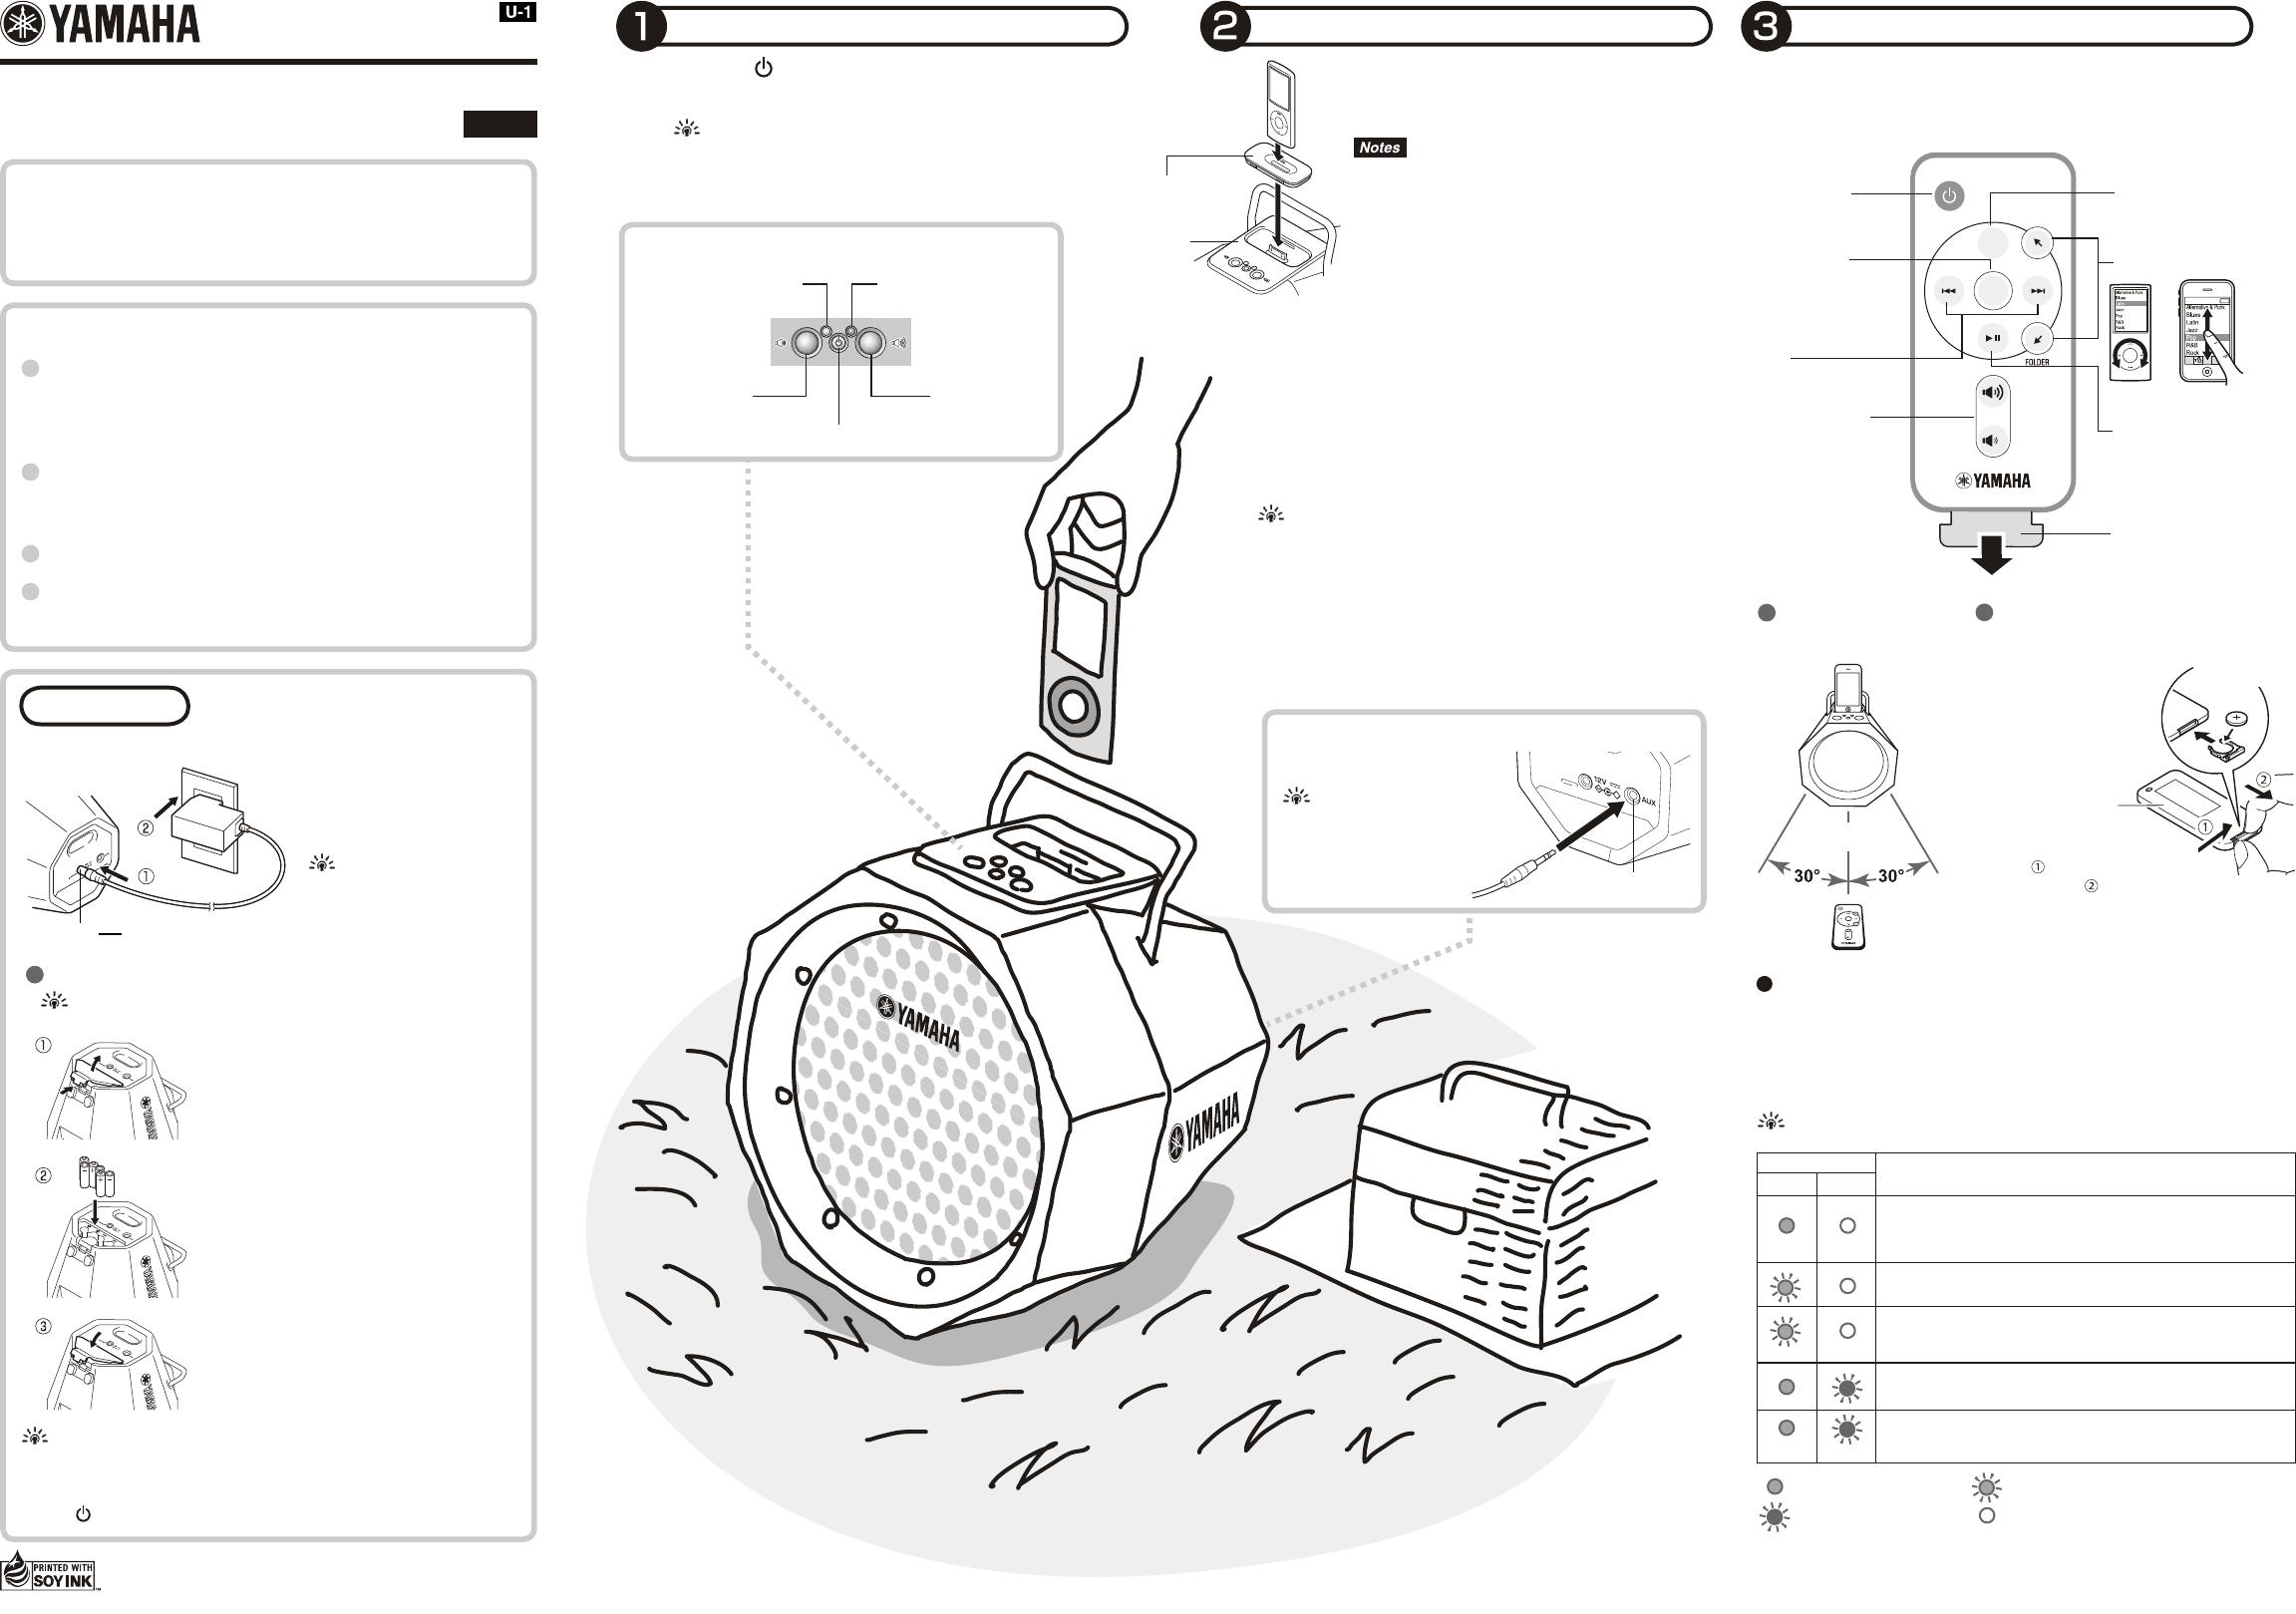 Ingersoll Rand 2475n7 5 Compressor Wiring Diagram